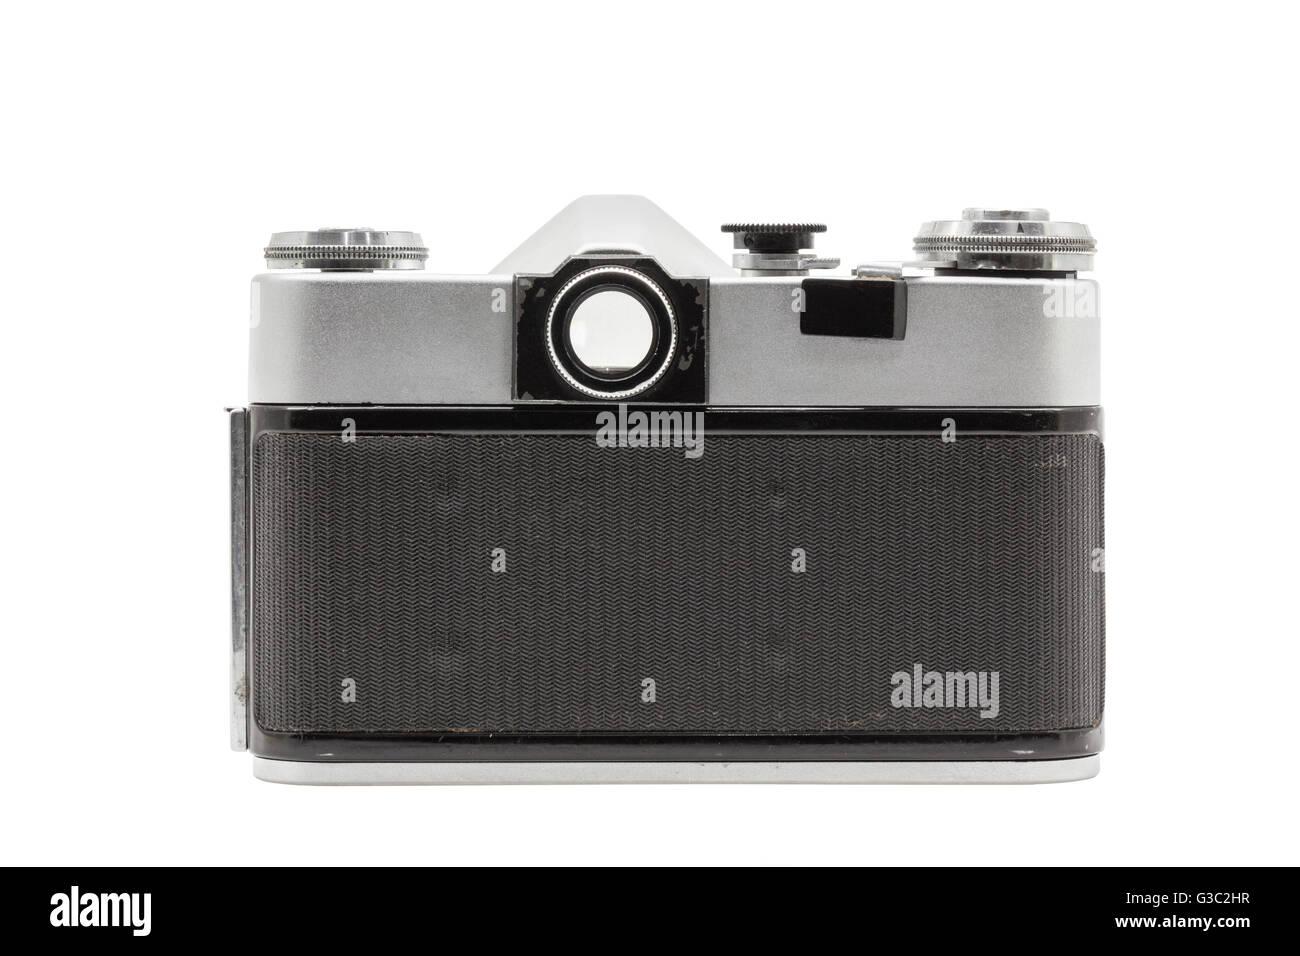 Retro soviet film camera isolated on white background. Soviet reflex camera. Back side view - Stock Image